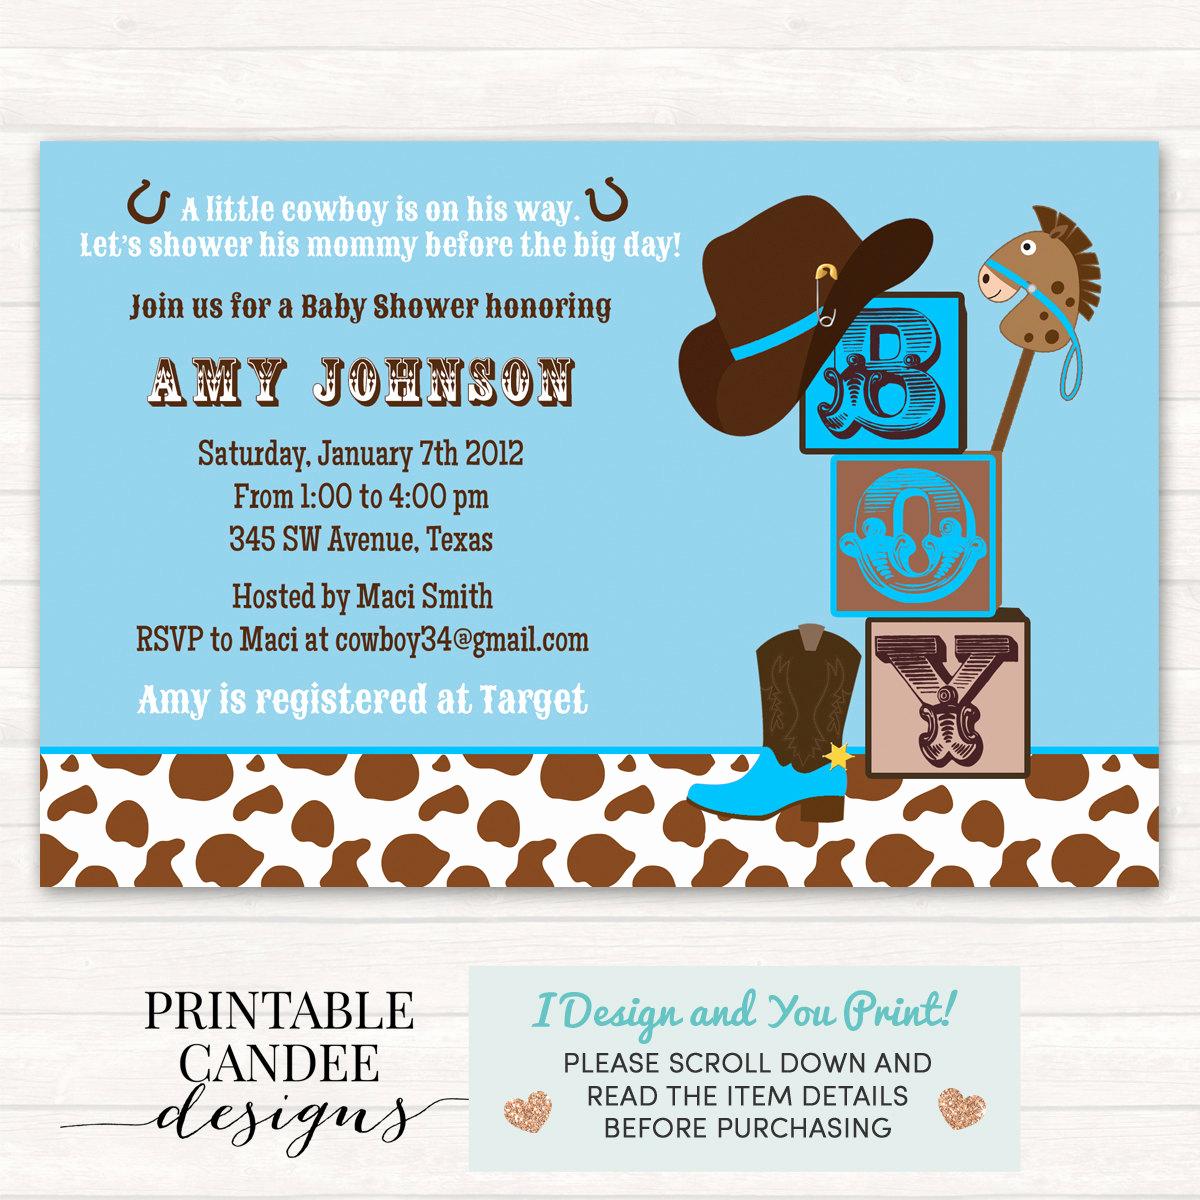 Western Baby Shower Invitation Template Luxury Cowboy Baby Shower Invitation Cowboy Baby Shower Western